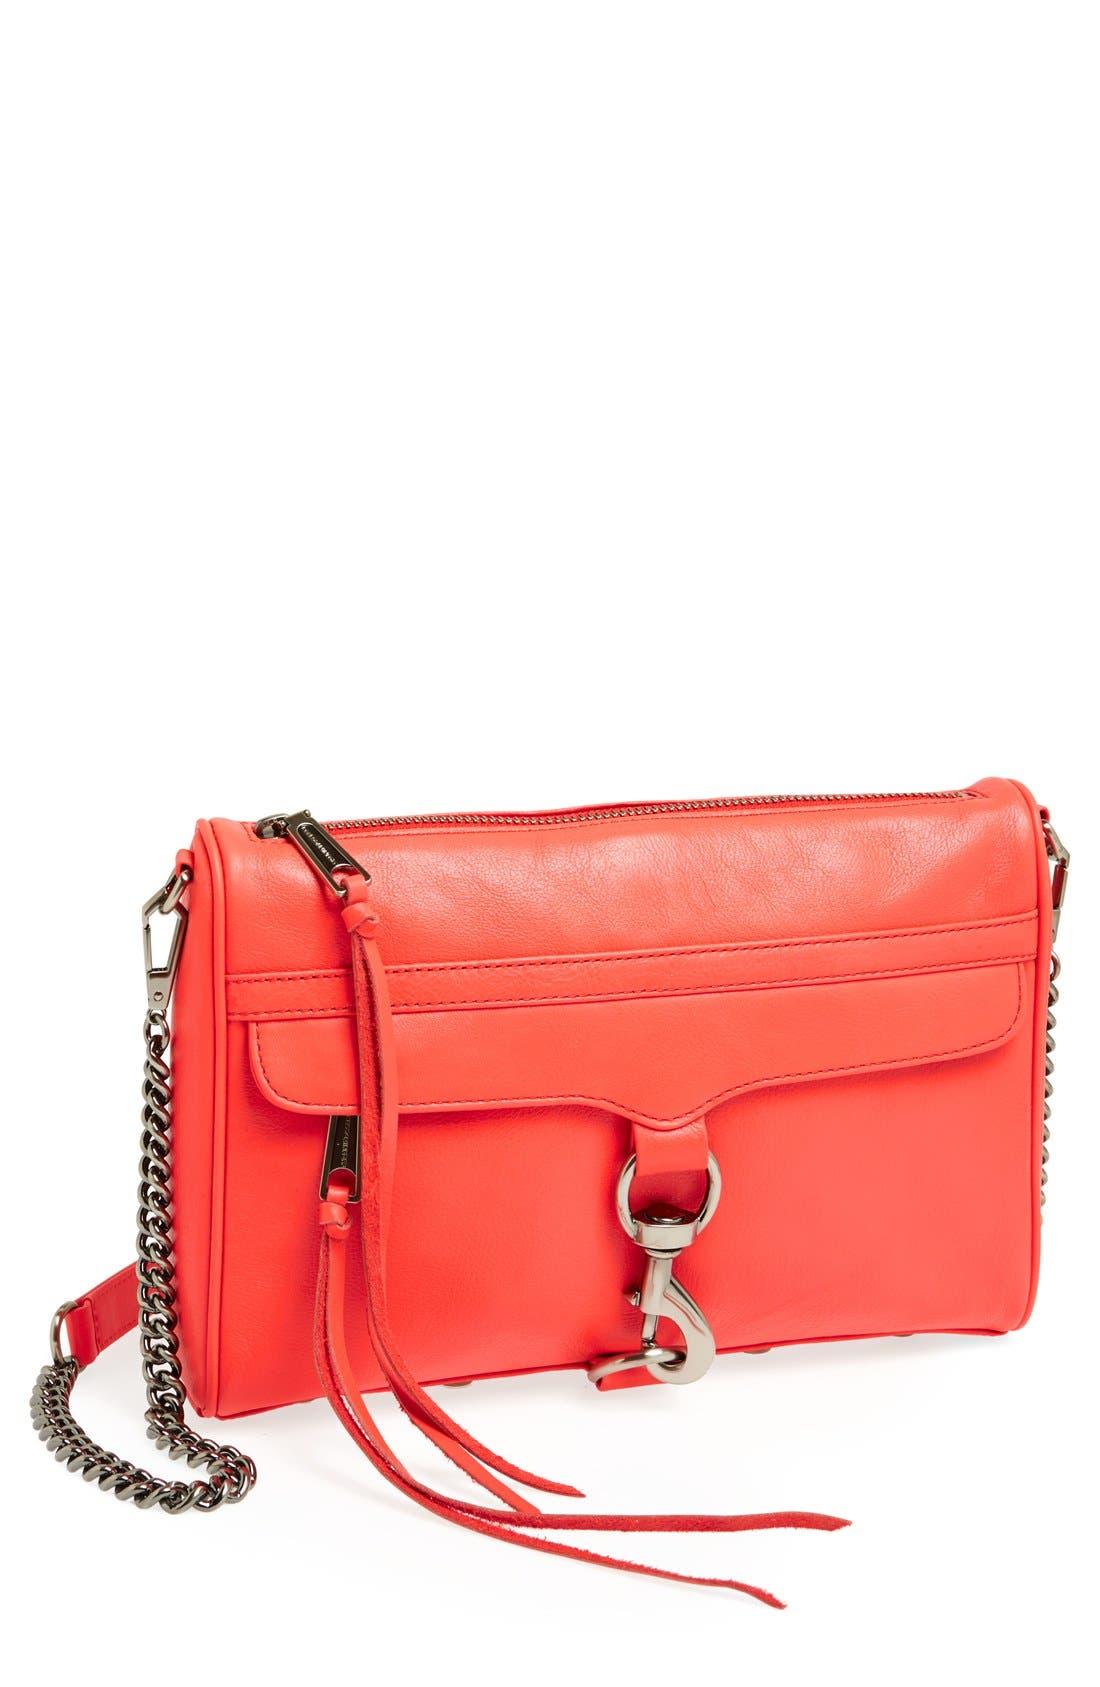 Main Image - Rebecca Minkoff 'MAC Clutch' Crossbody Bag